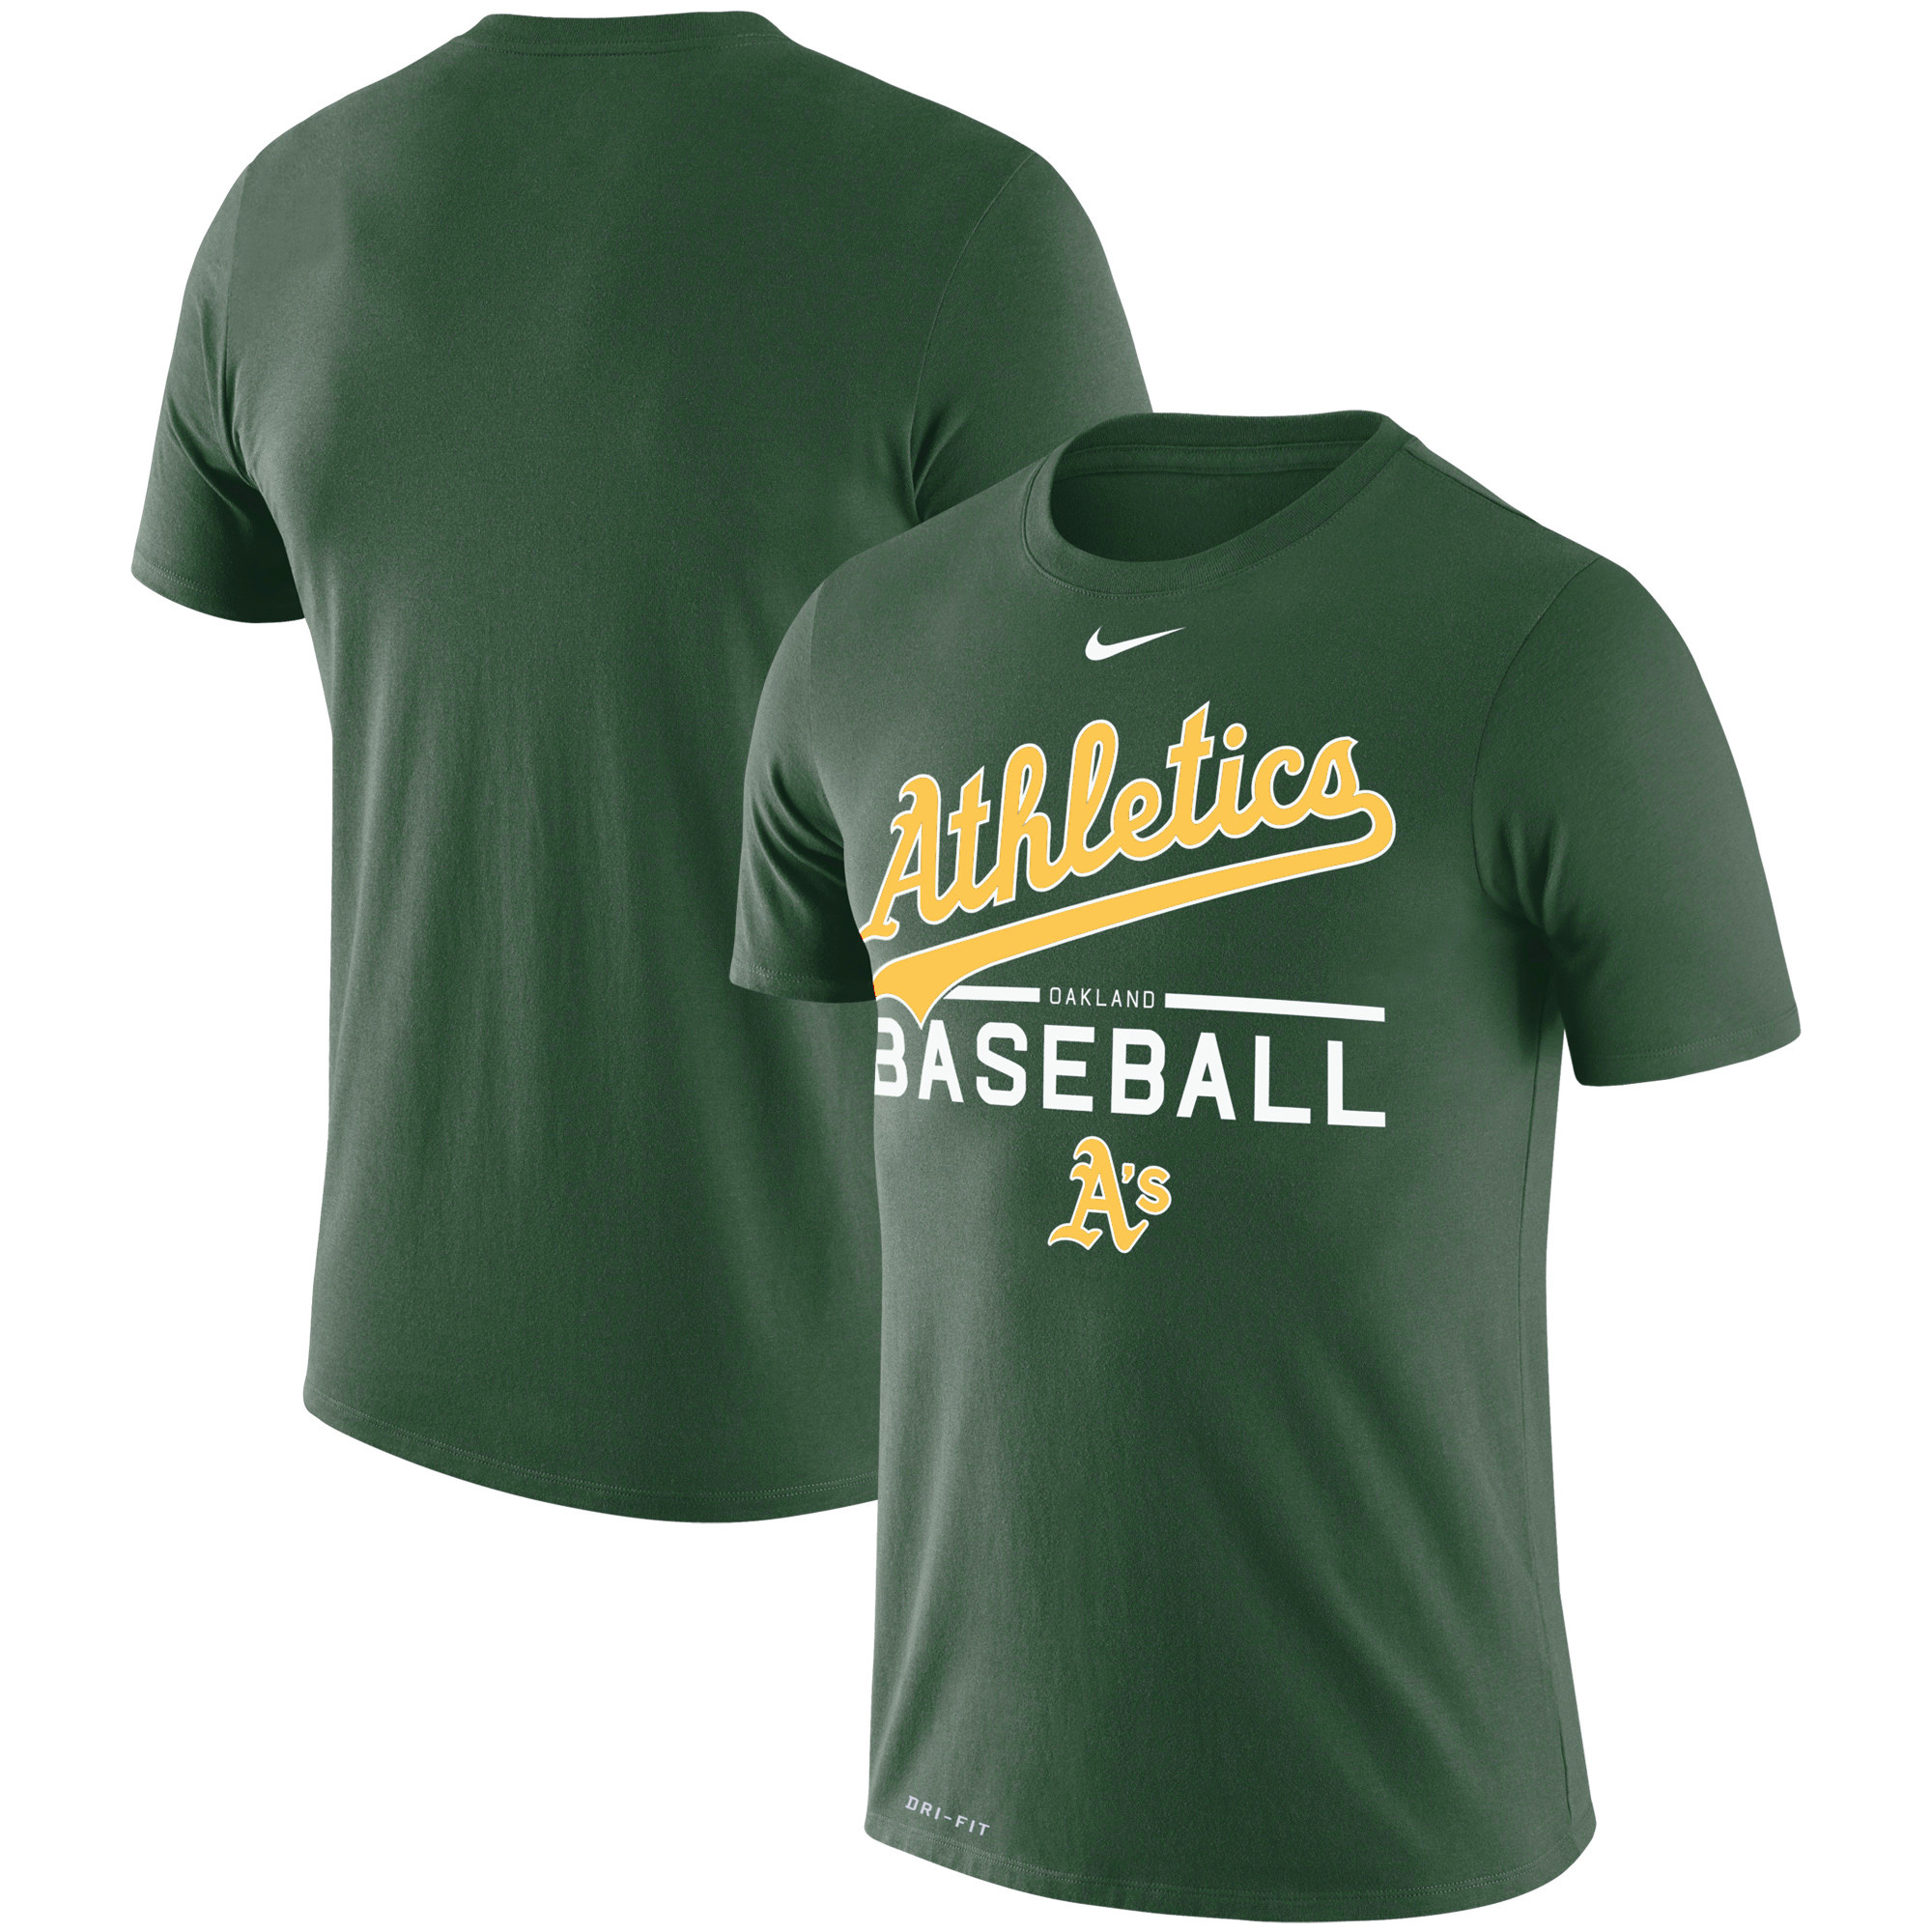 Oakland Athletics Nike Practice Performance T-Shirt - Green